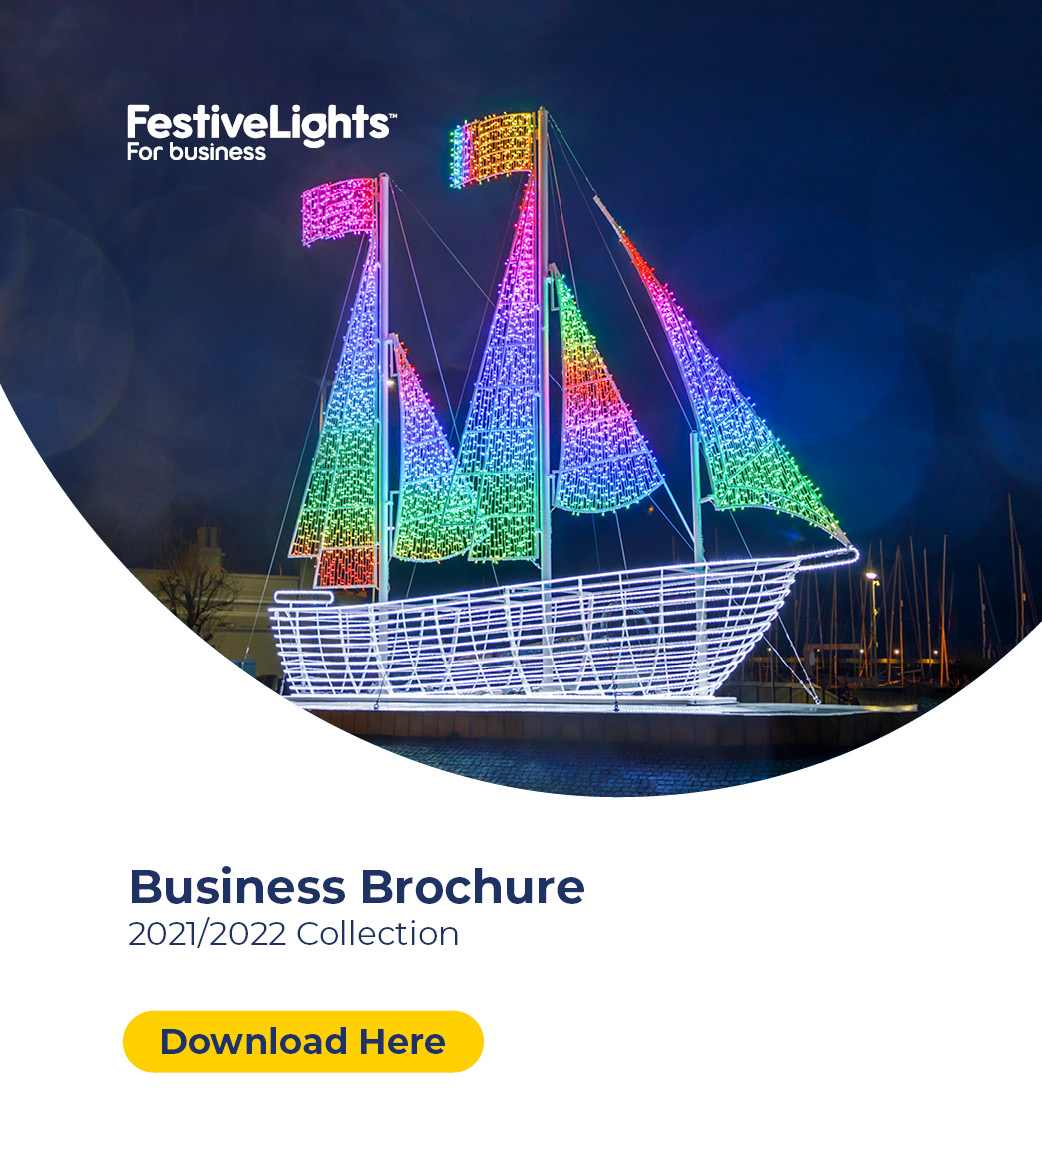 Festive Lights 2021/22 Collection Brochure